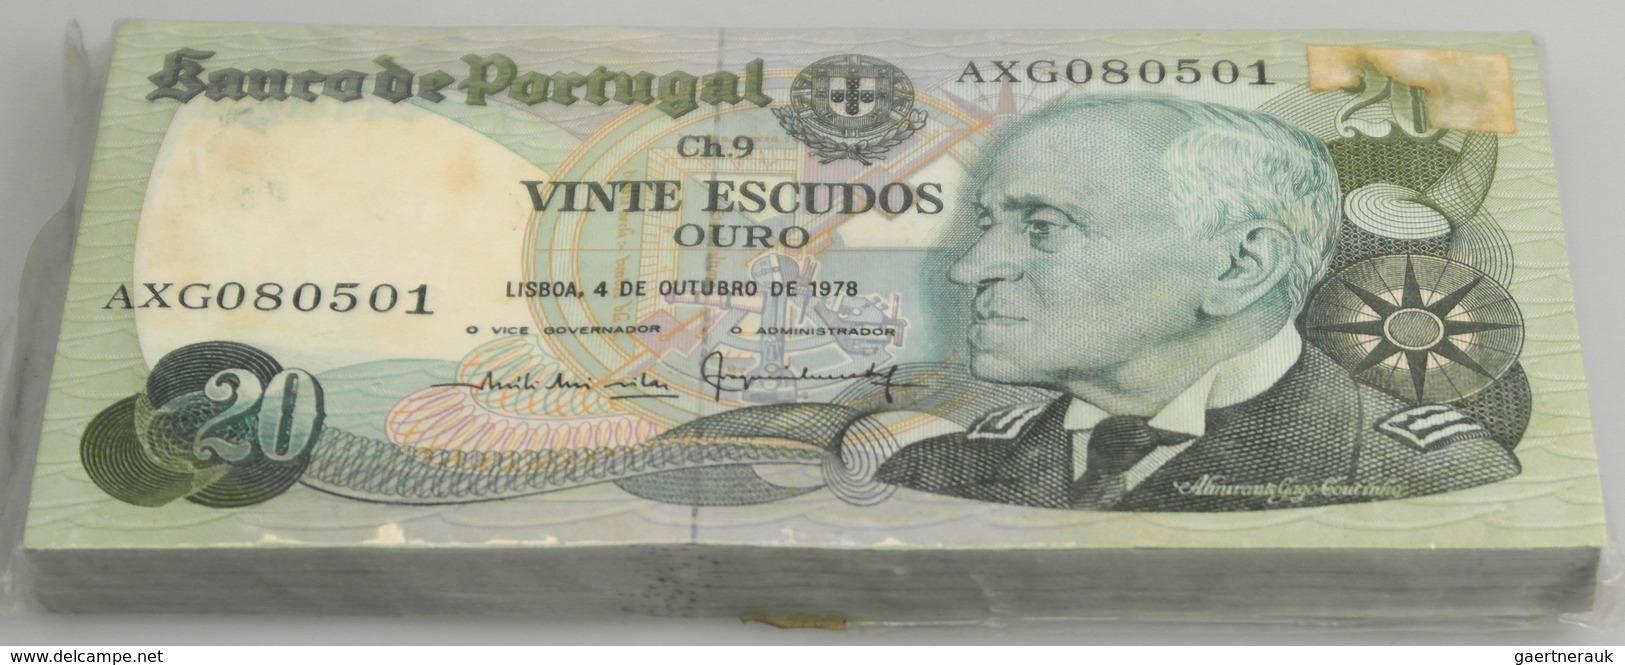 Portugal: Full Bundle Of 100 Pcs 20 Escudos 1978 P. 176b In UNC. (100 Pcs) - Portugal